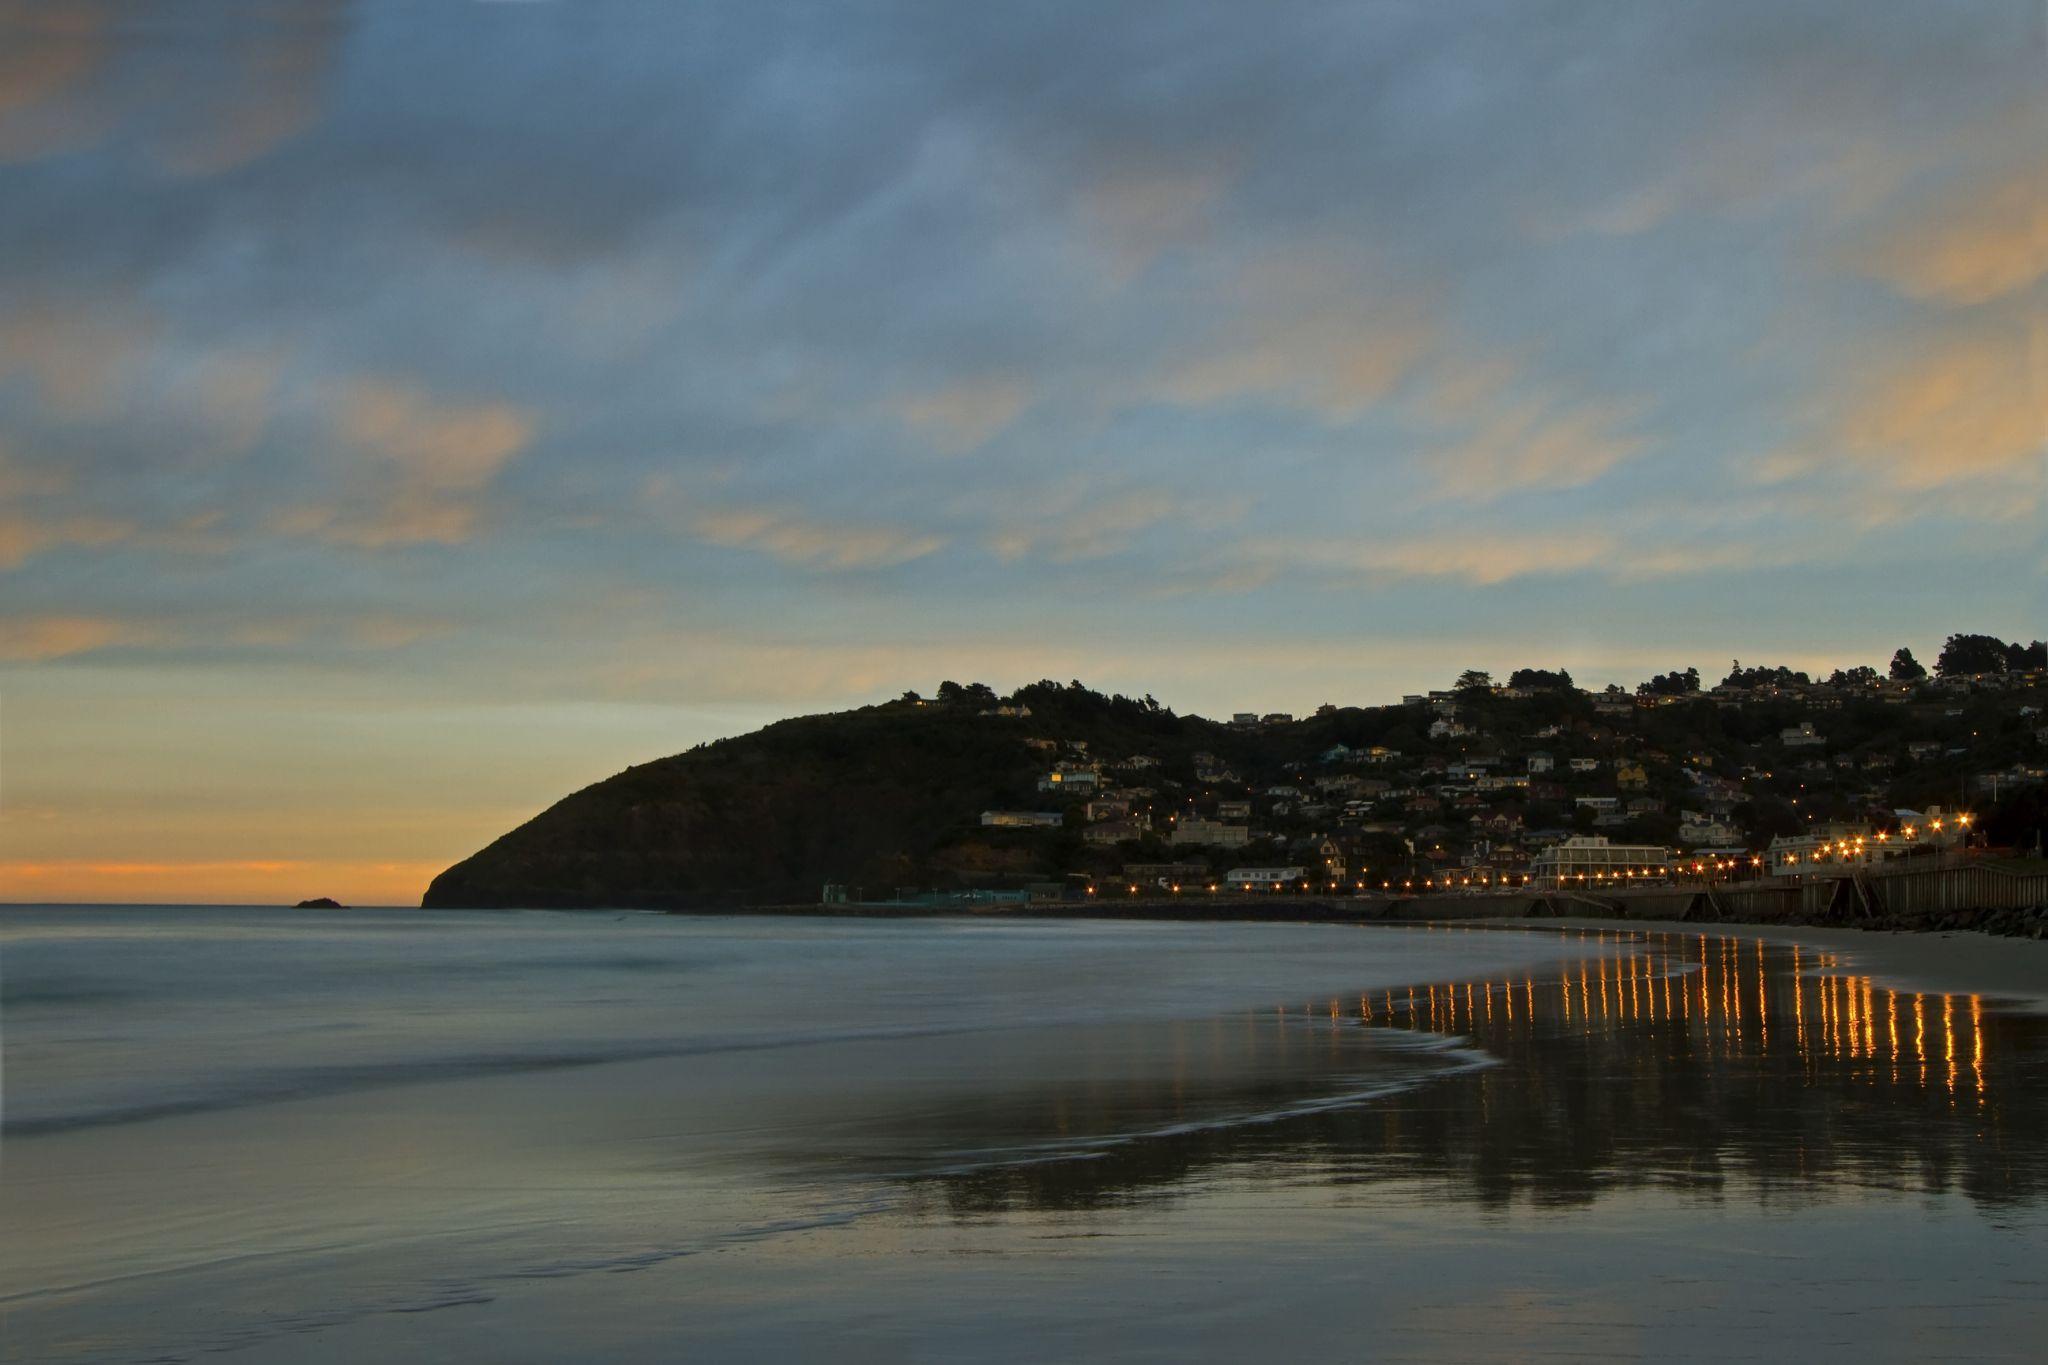 St Clair Beach and the Esplanade, Dunedin by Lloyd Palmer Photography (LPics)